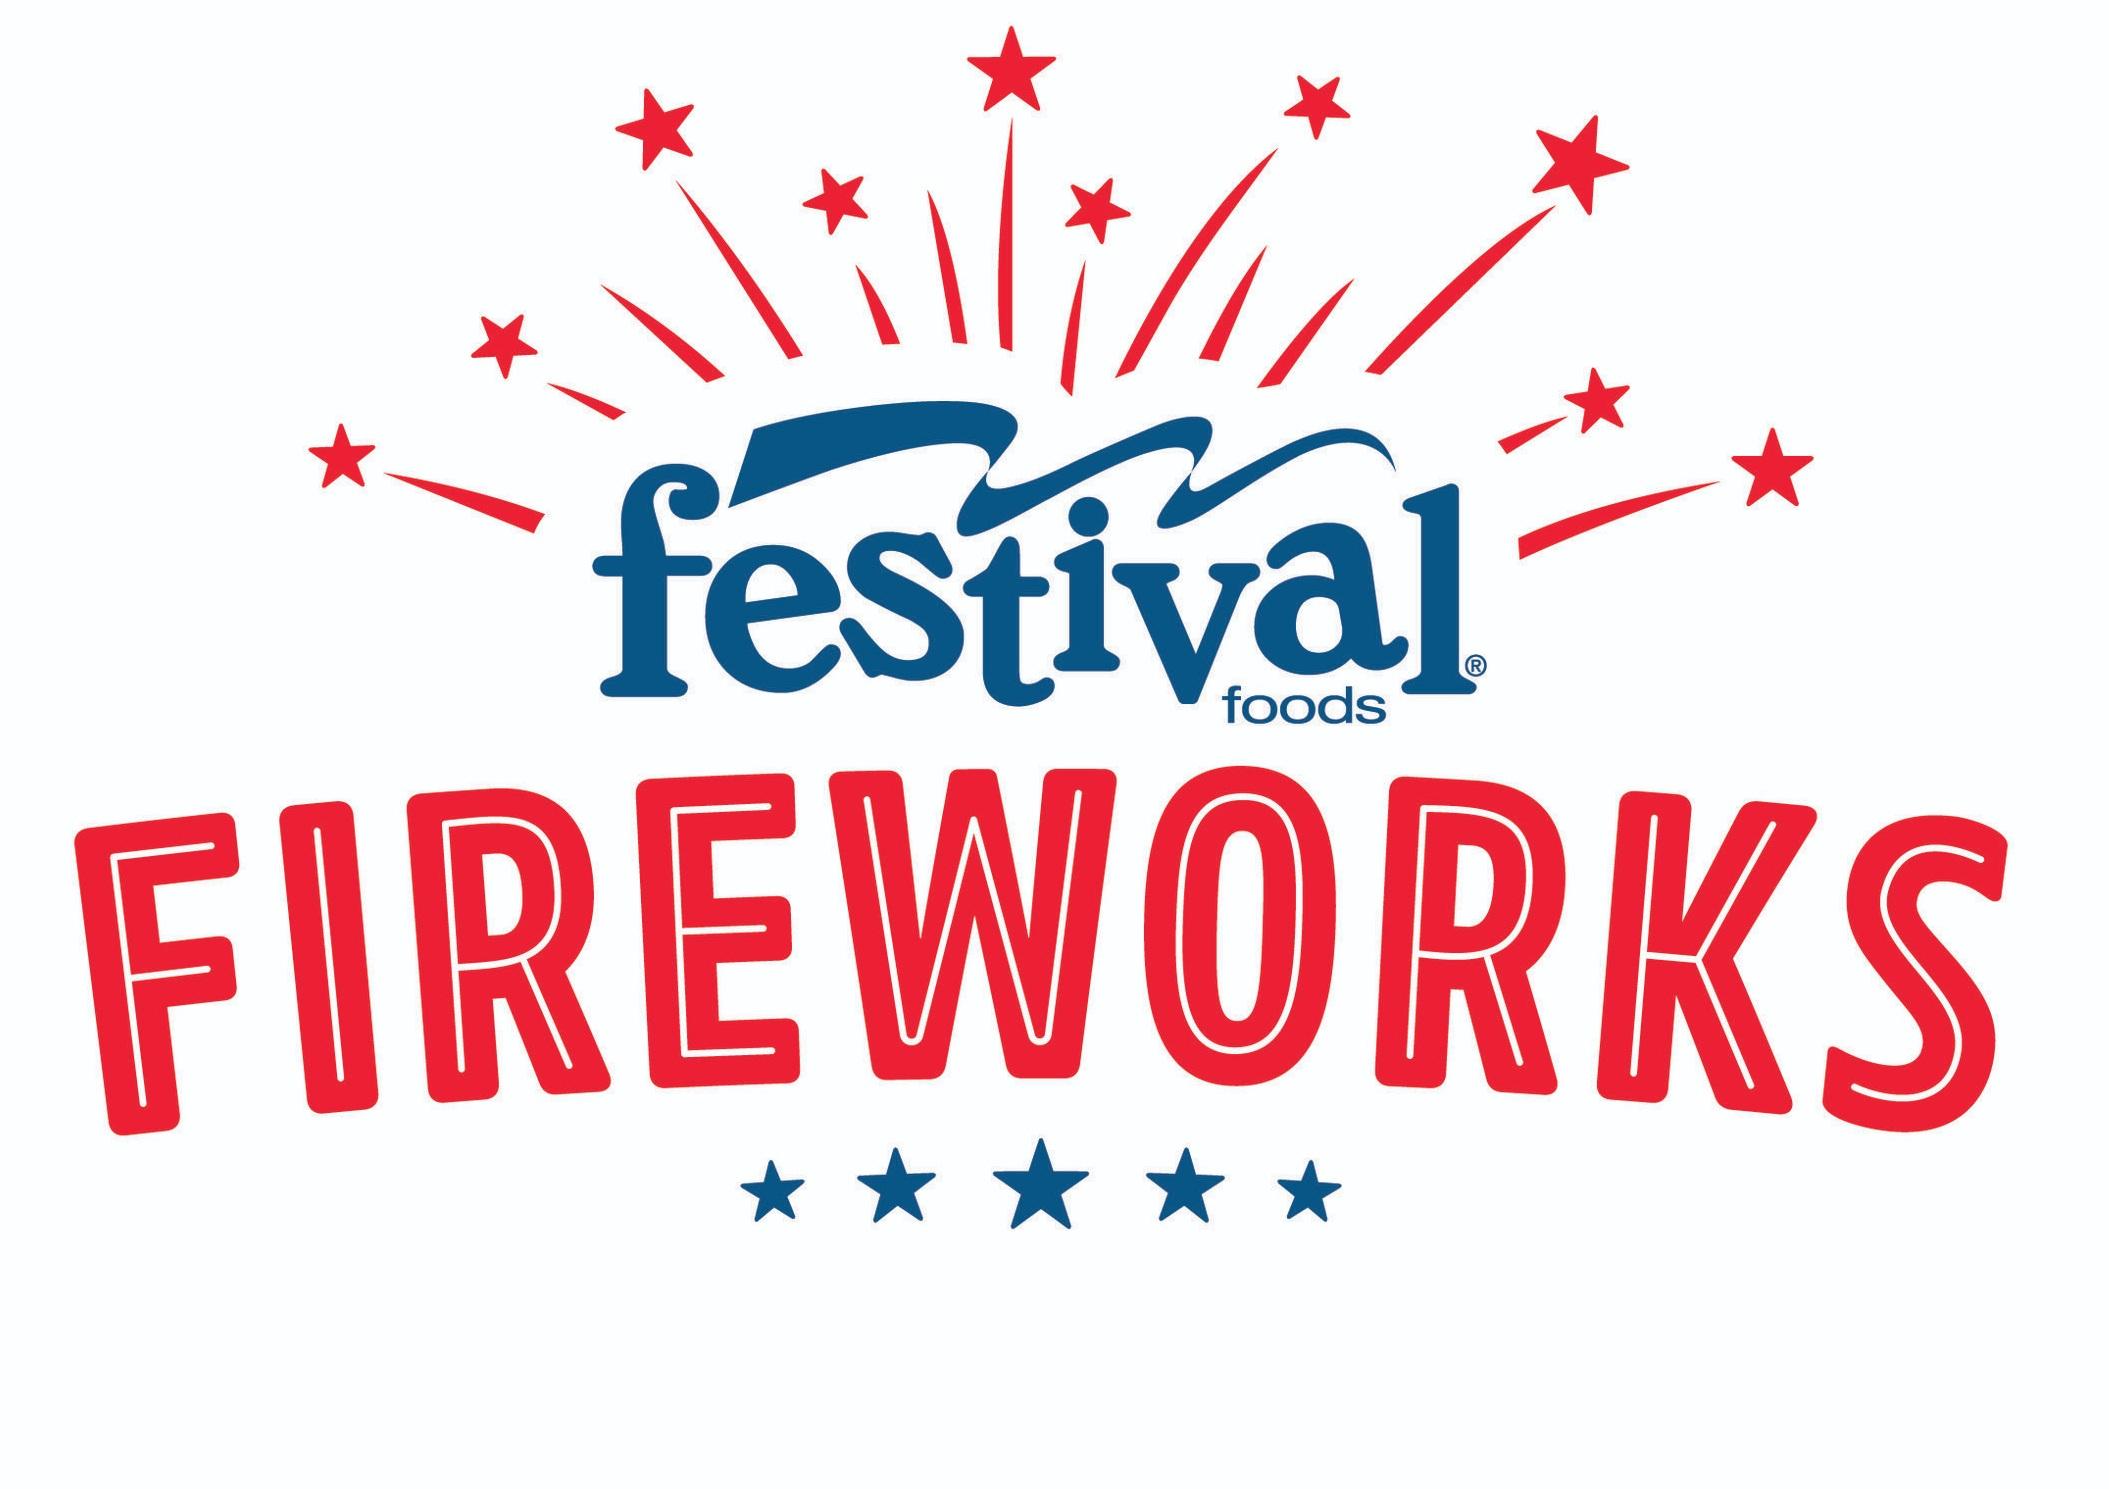 SFF-17032_Festival+Fireworks-2C+%281%29.jpg